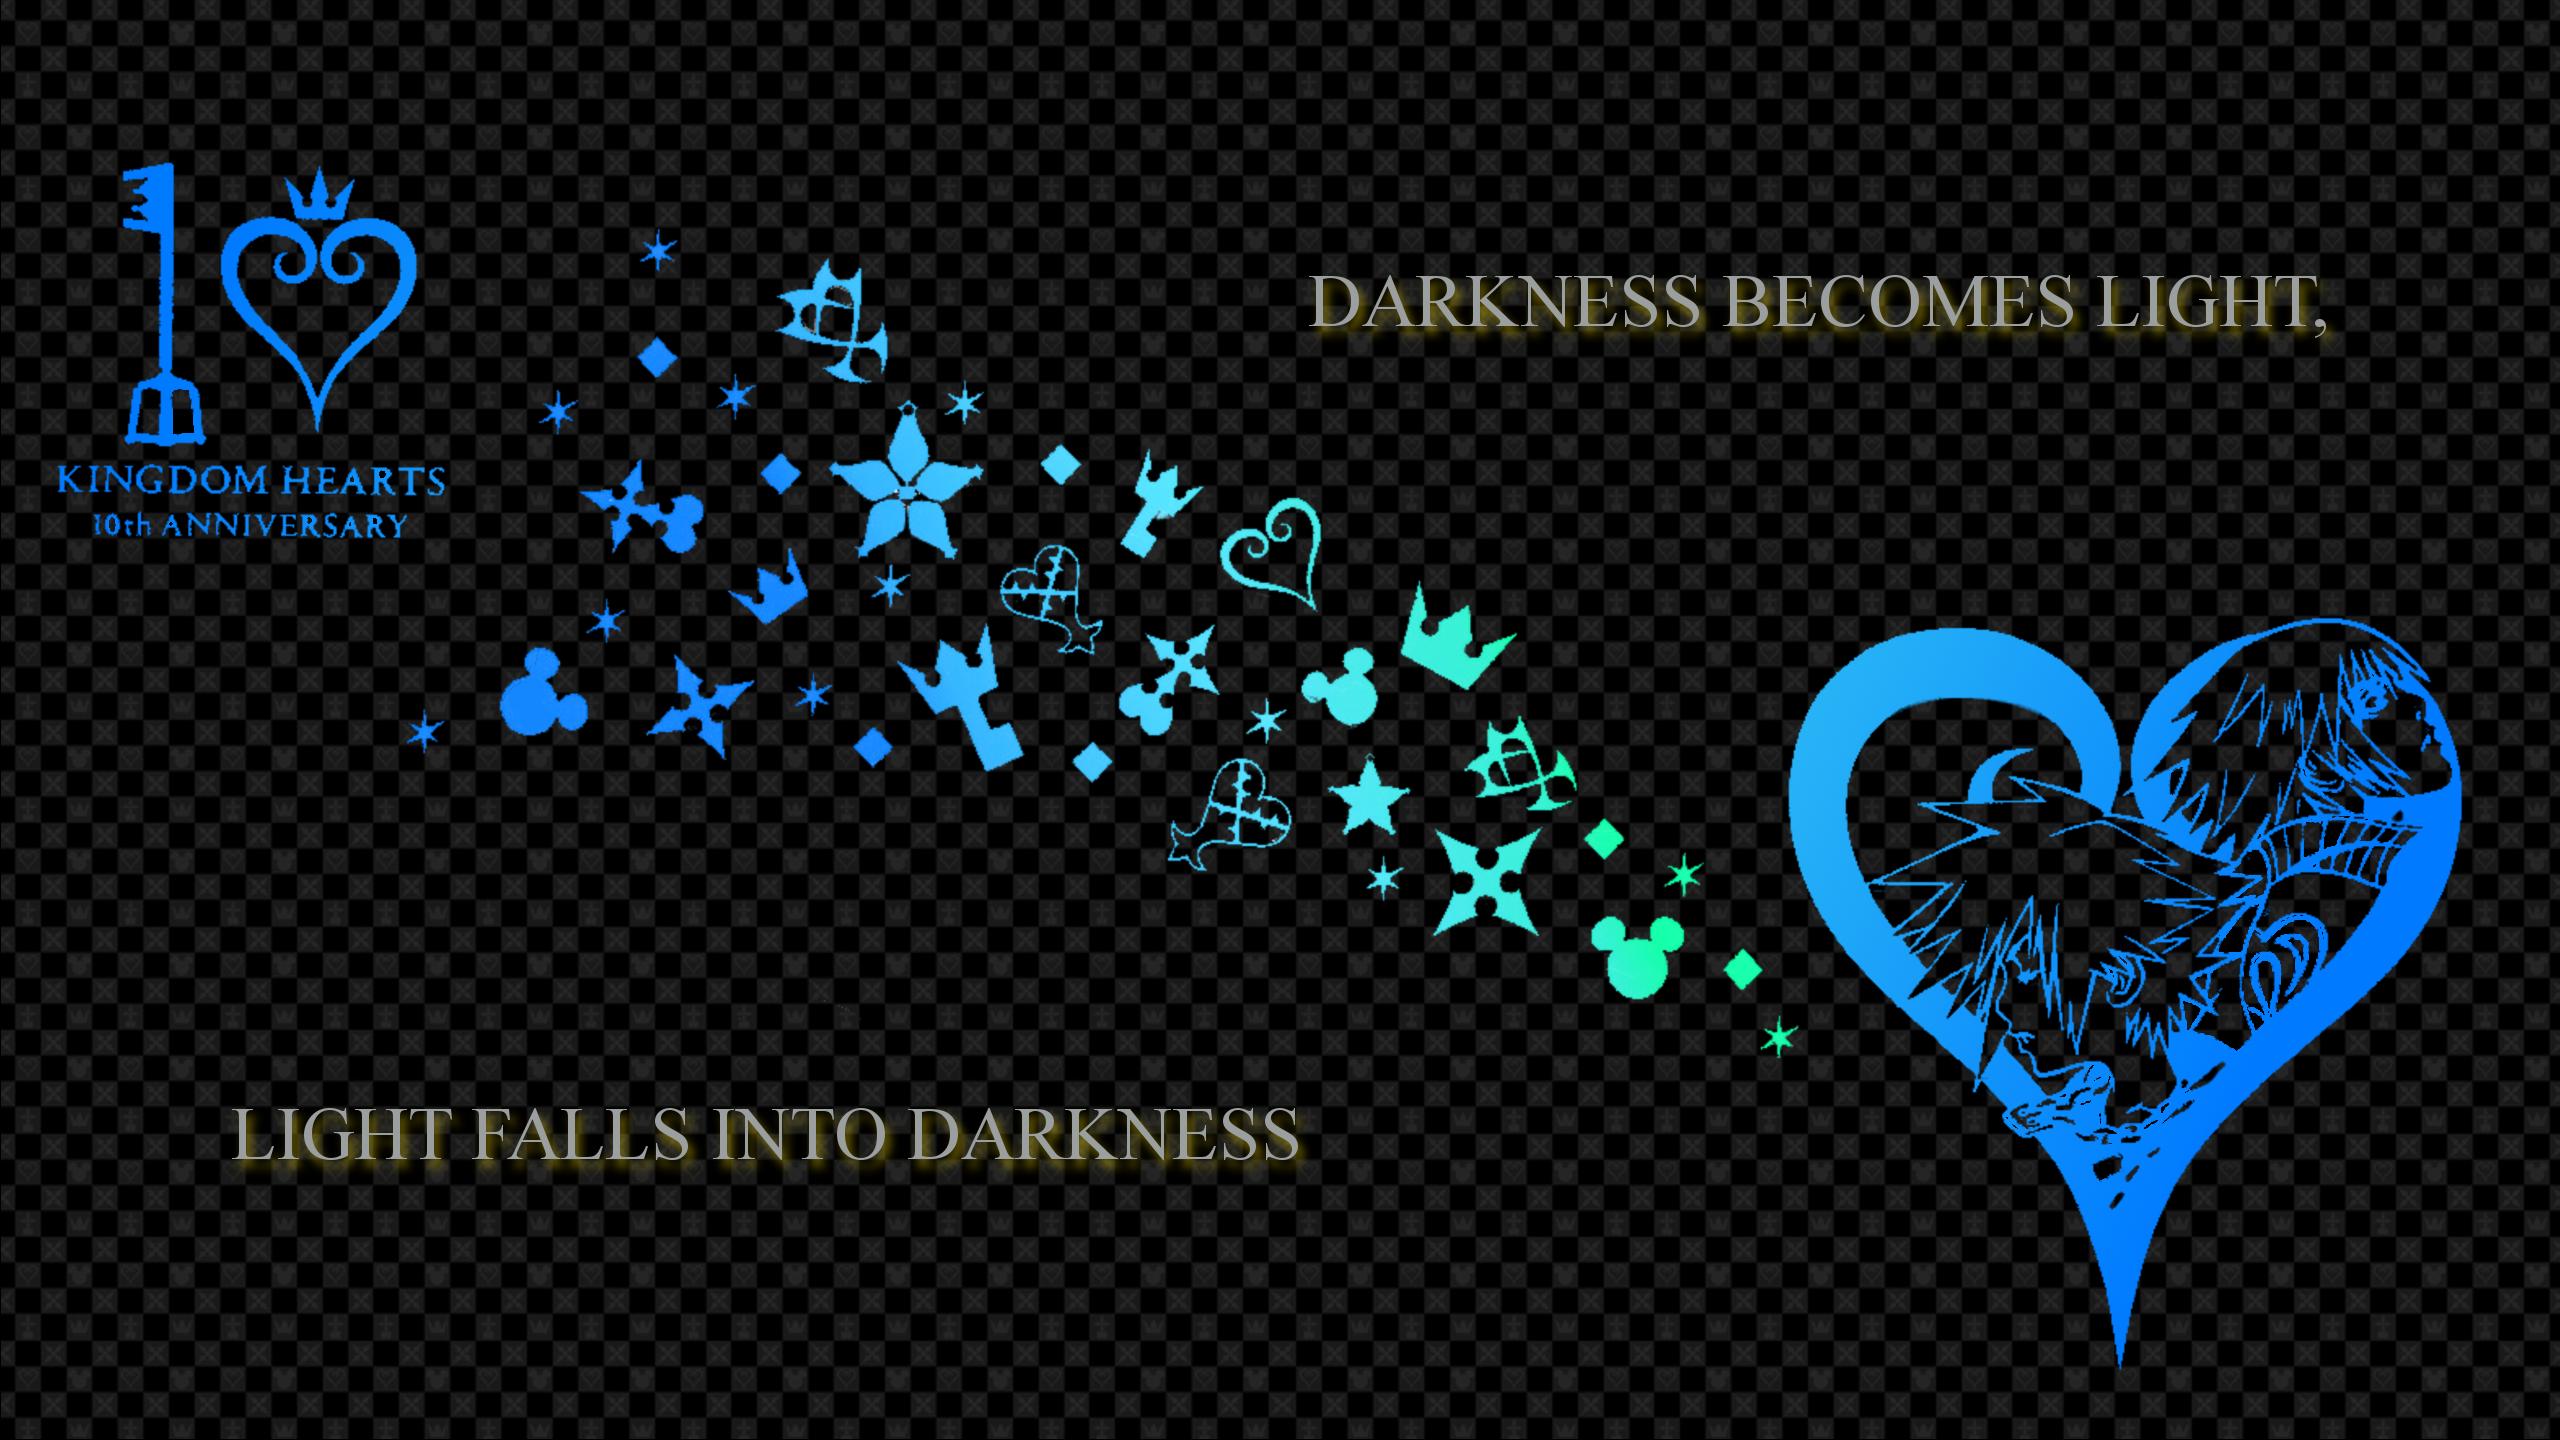 Kingdom Hearts Wallpaper キングダムハーツ 壁紙 キングダムハーツ